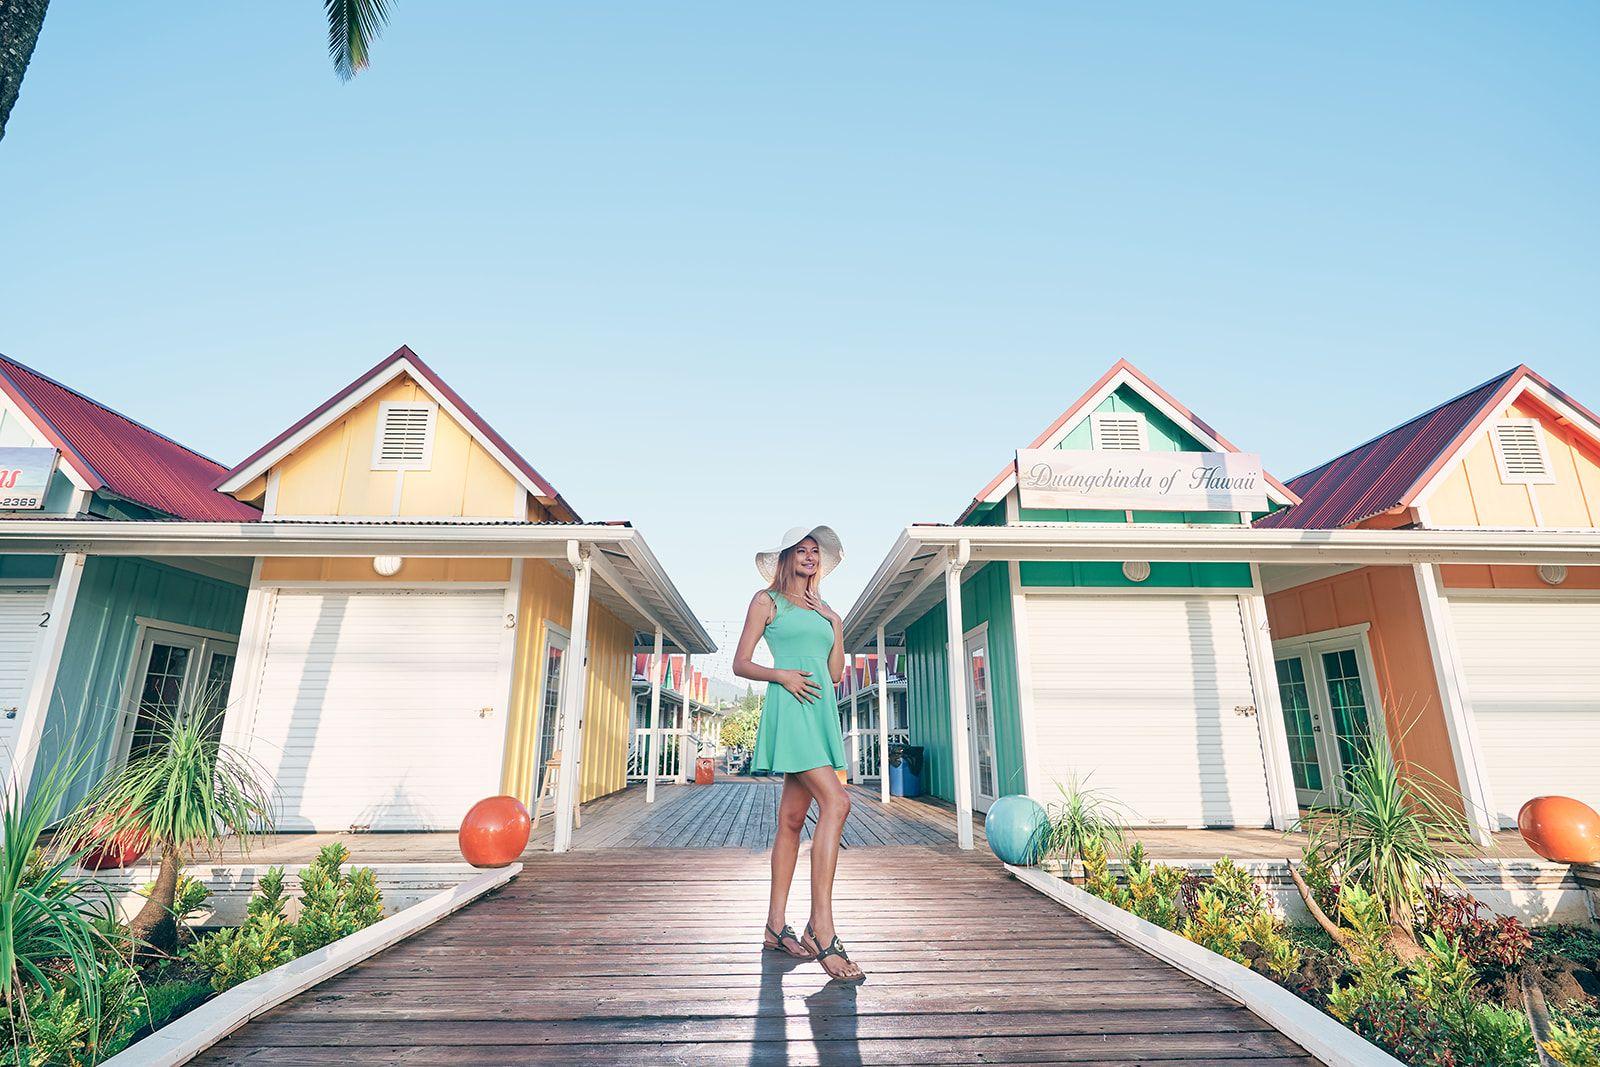 kauai-lifestyle-portraits-noka-market-by-afewgoodclicks 29